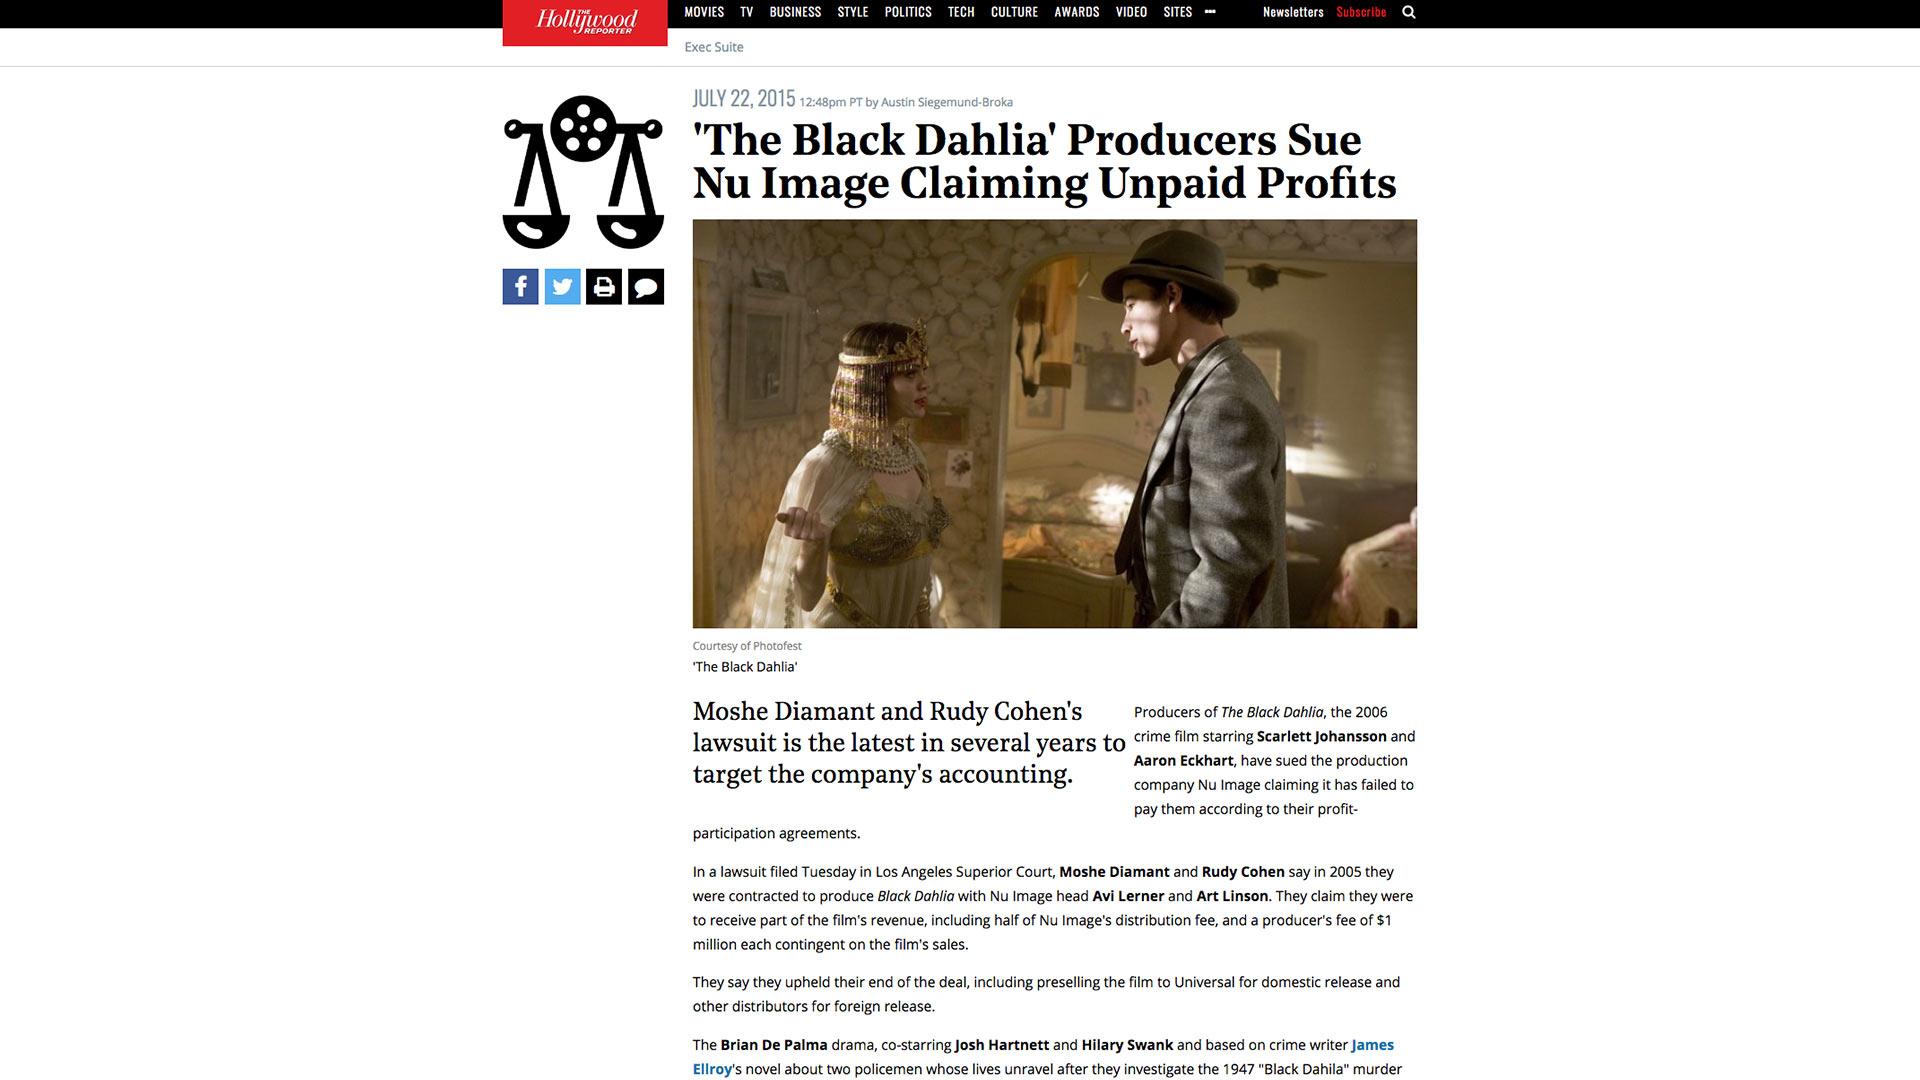 Fairness Rocks News 'The Black Dahlia' Producers Sue Nu Image Claiming Unpaid Profits